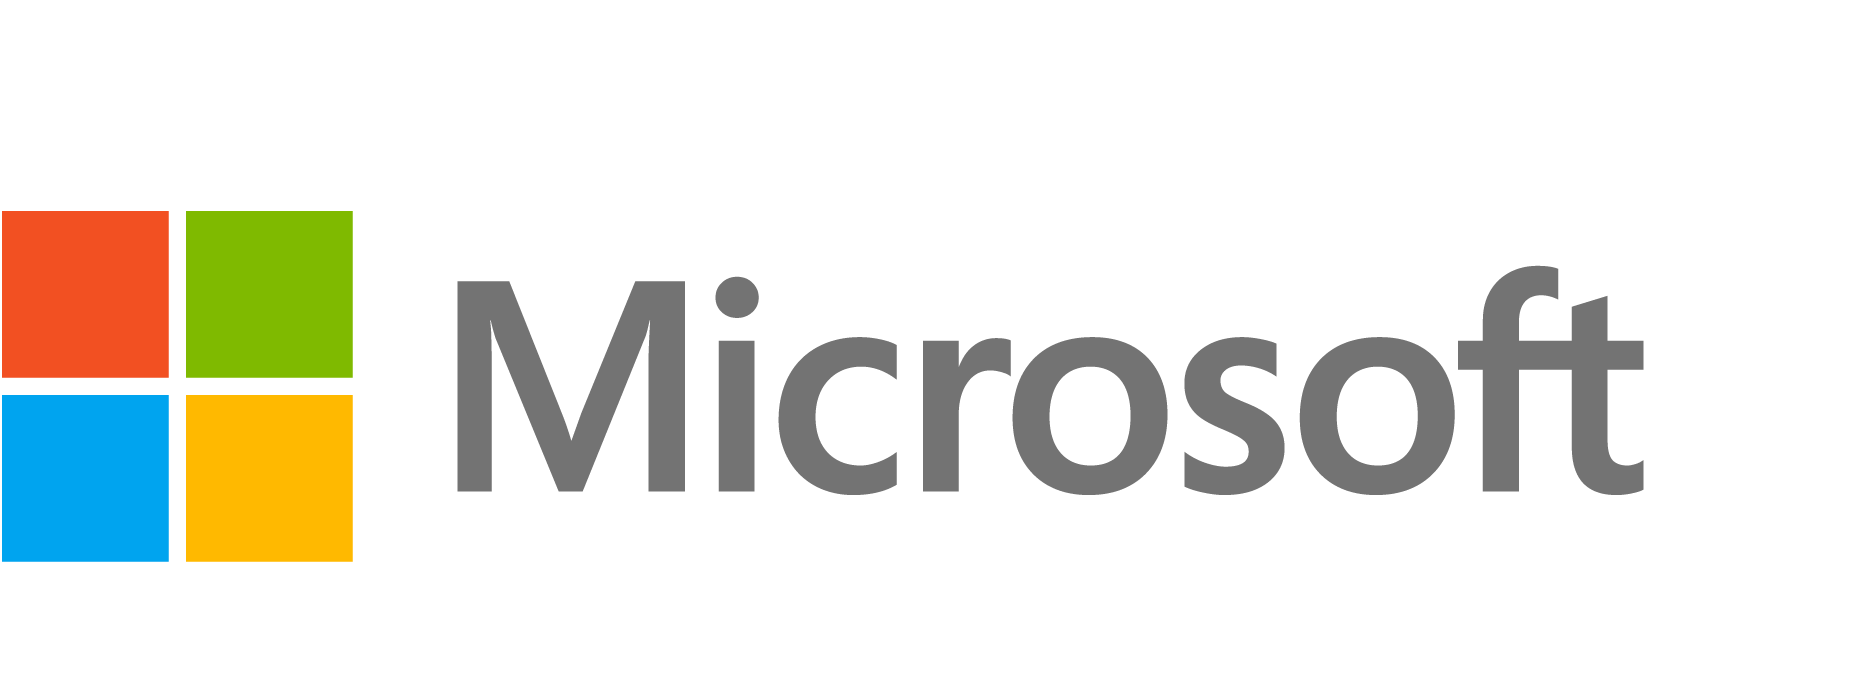 05247ae38eeadf8cdff56125deac8b0c_Microsoft-Logo-PNG.png